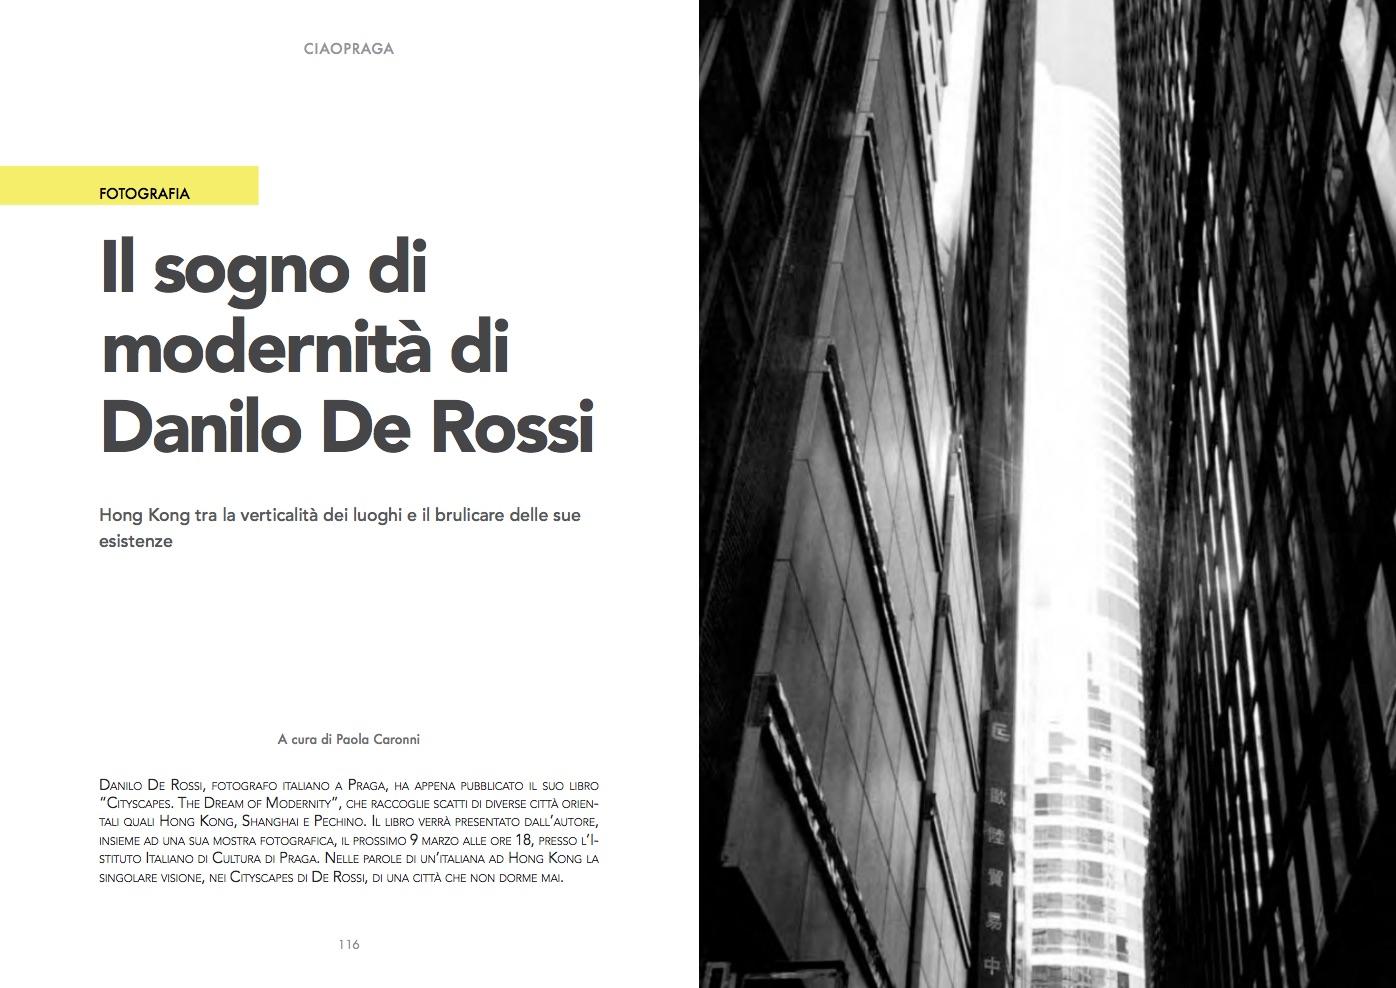 Ciao Praga Magazine Volume 4 -  Article by Paola Caronni -  read in full (in Italian)